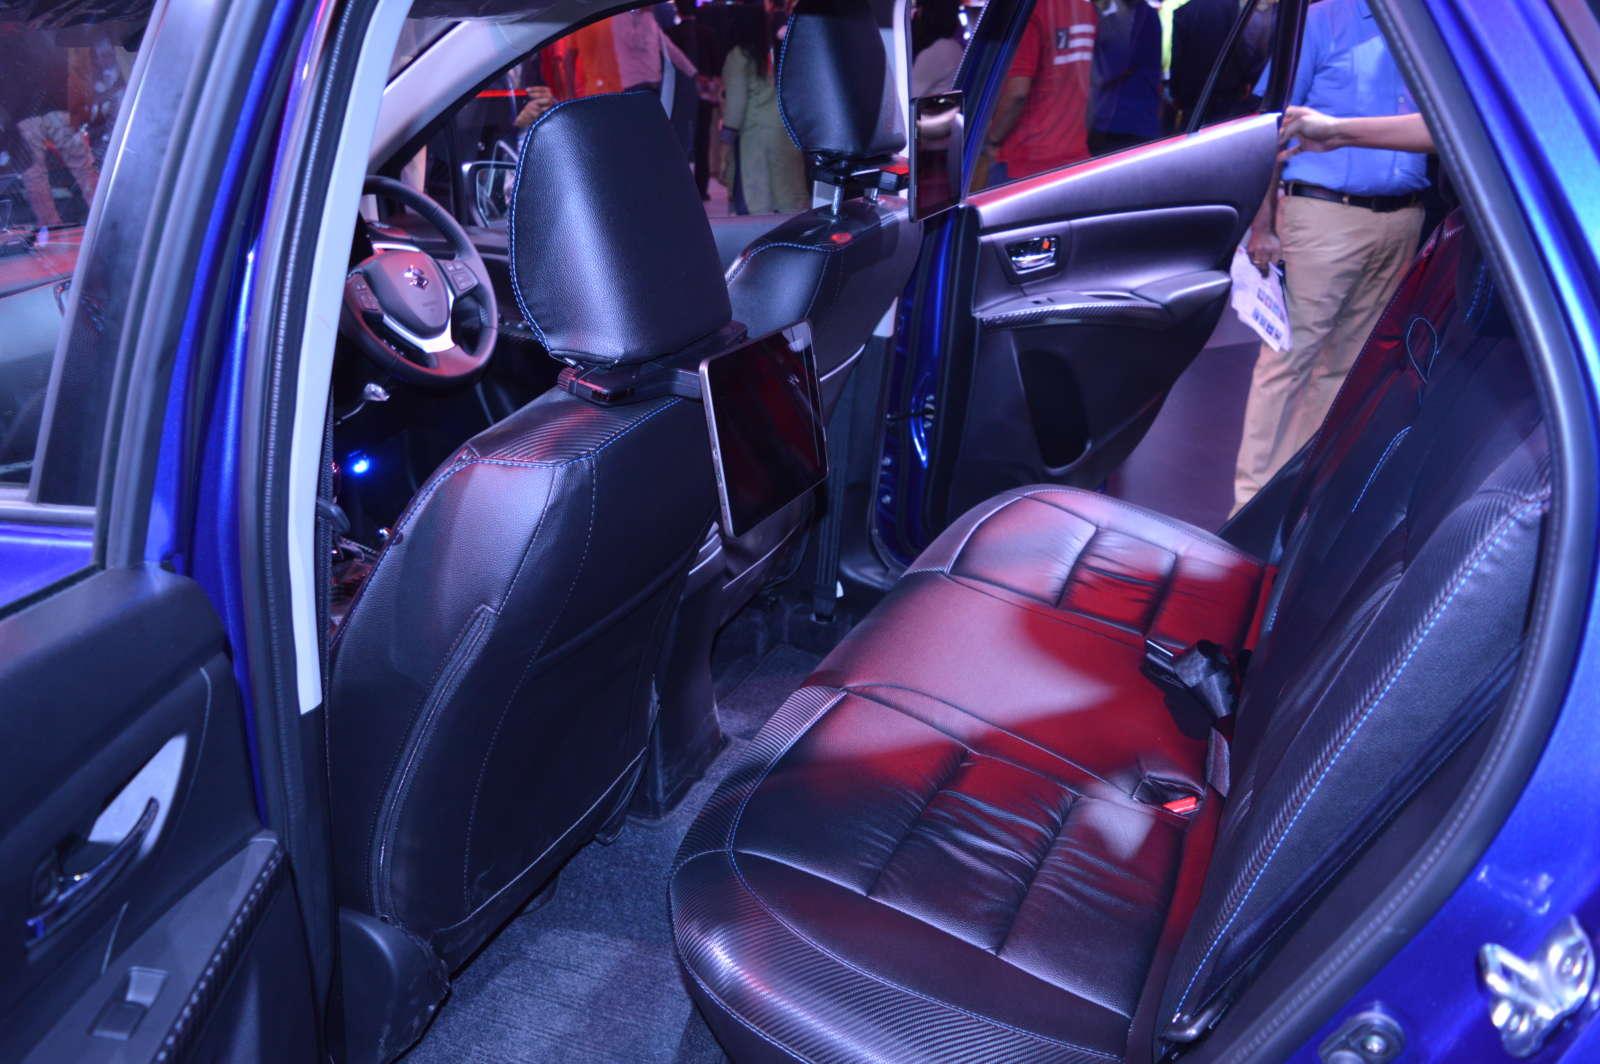 Maruti Suzuki S-Cross LImited edition (26)